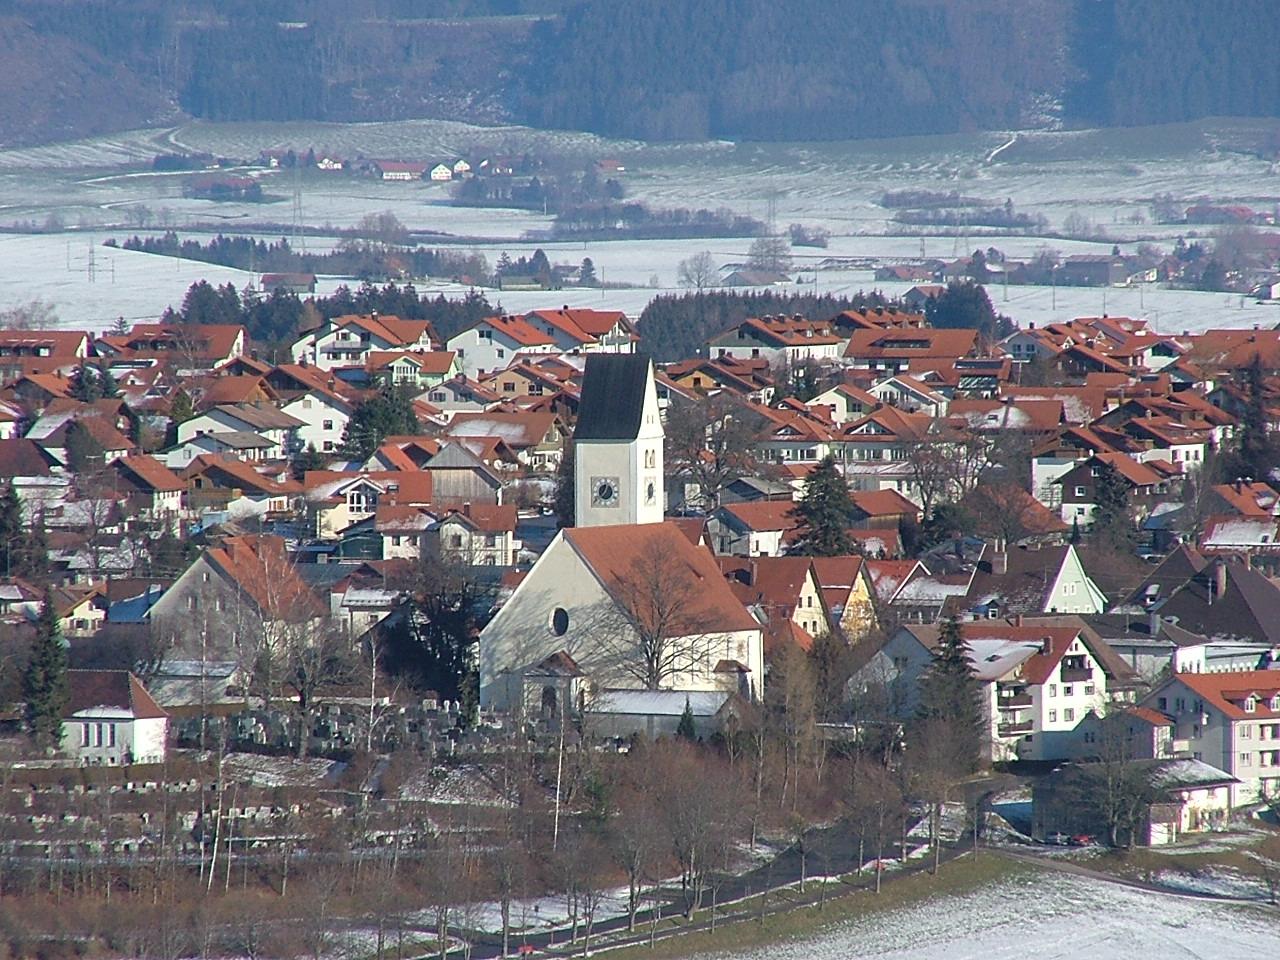 Krugzell